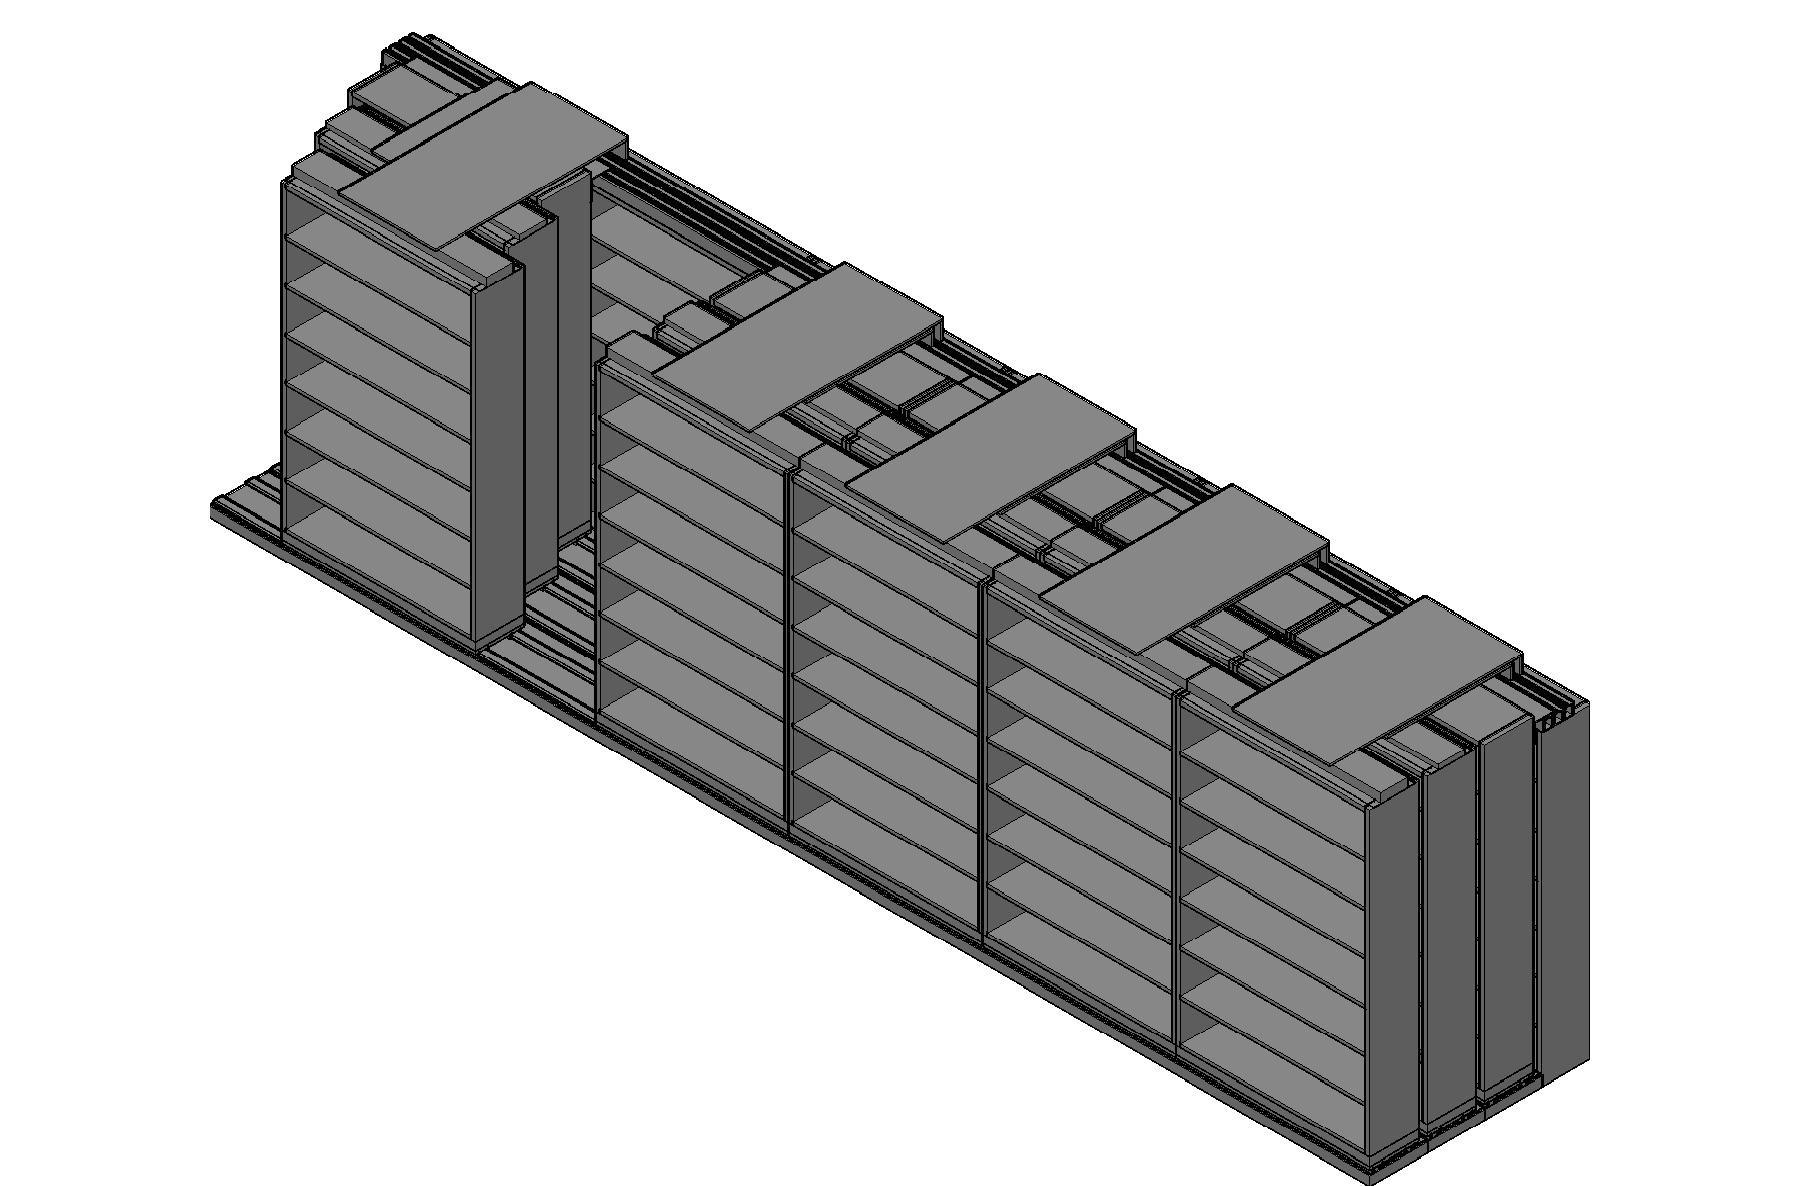 "Letter Size Sliding Shelves - 4 Rows Deep - 7 Levels - (48"" x 12"" Shelves) - 292"" Total Width"